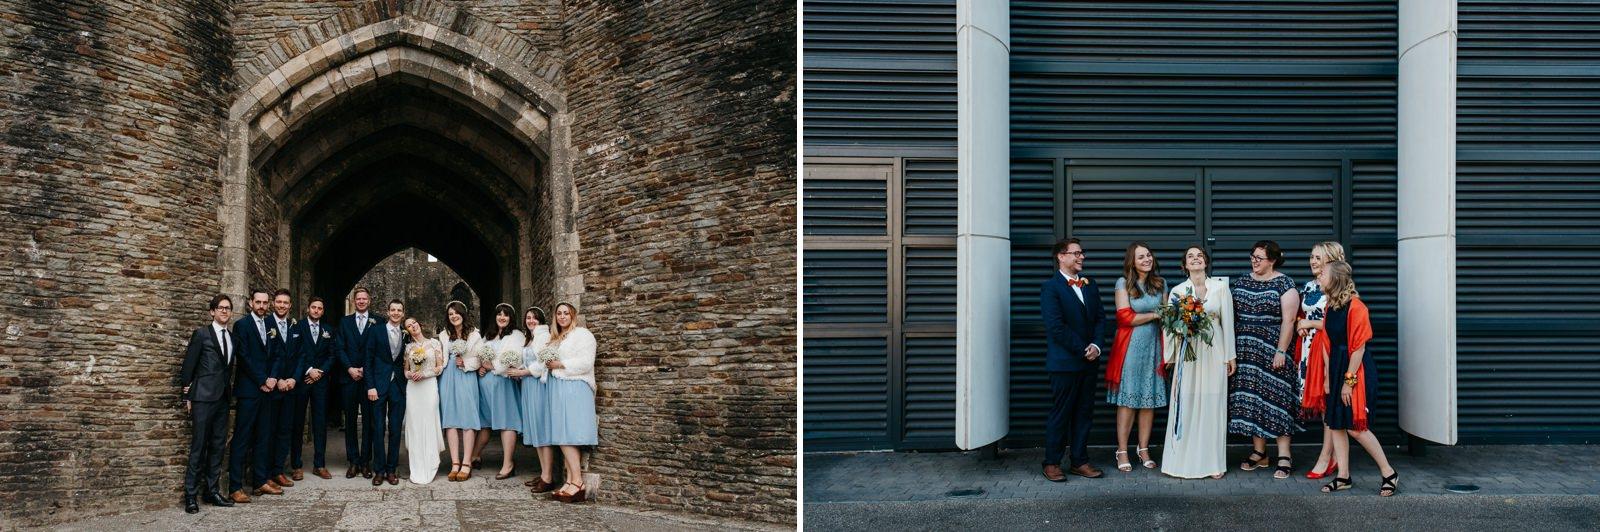 Best Creative Weddings 2016 by London, Oxfordshire and Bath based wedding photographer Elaine Williams.